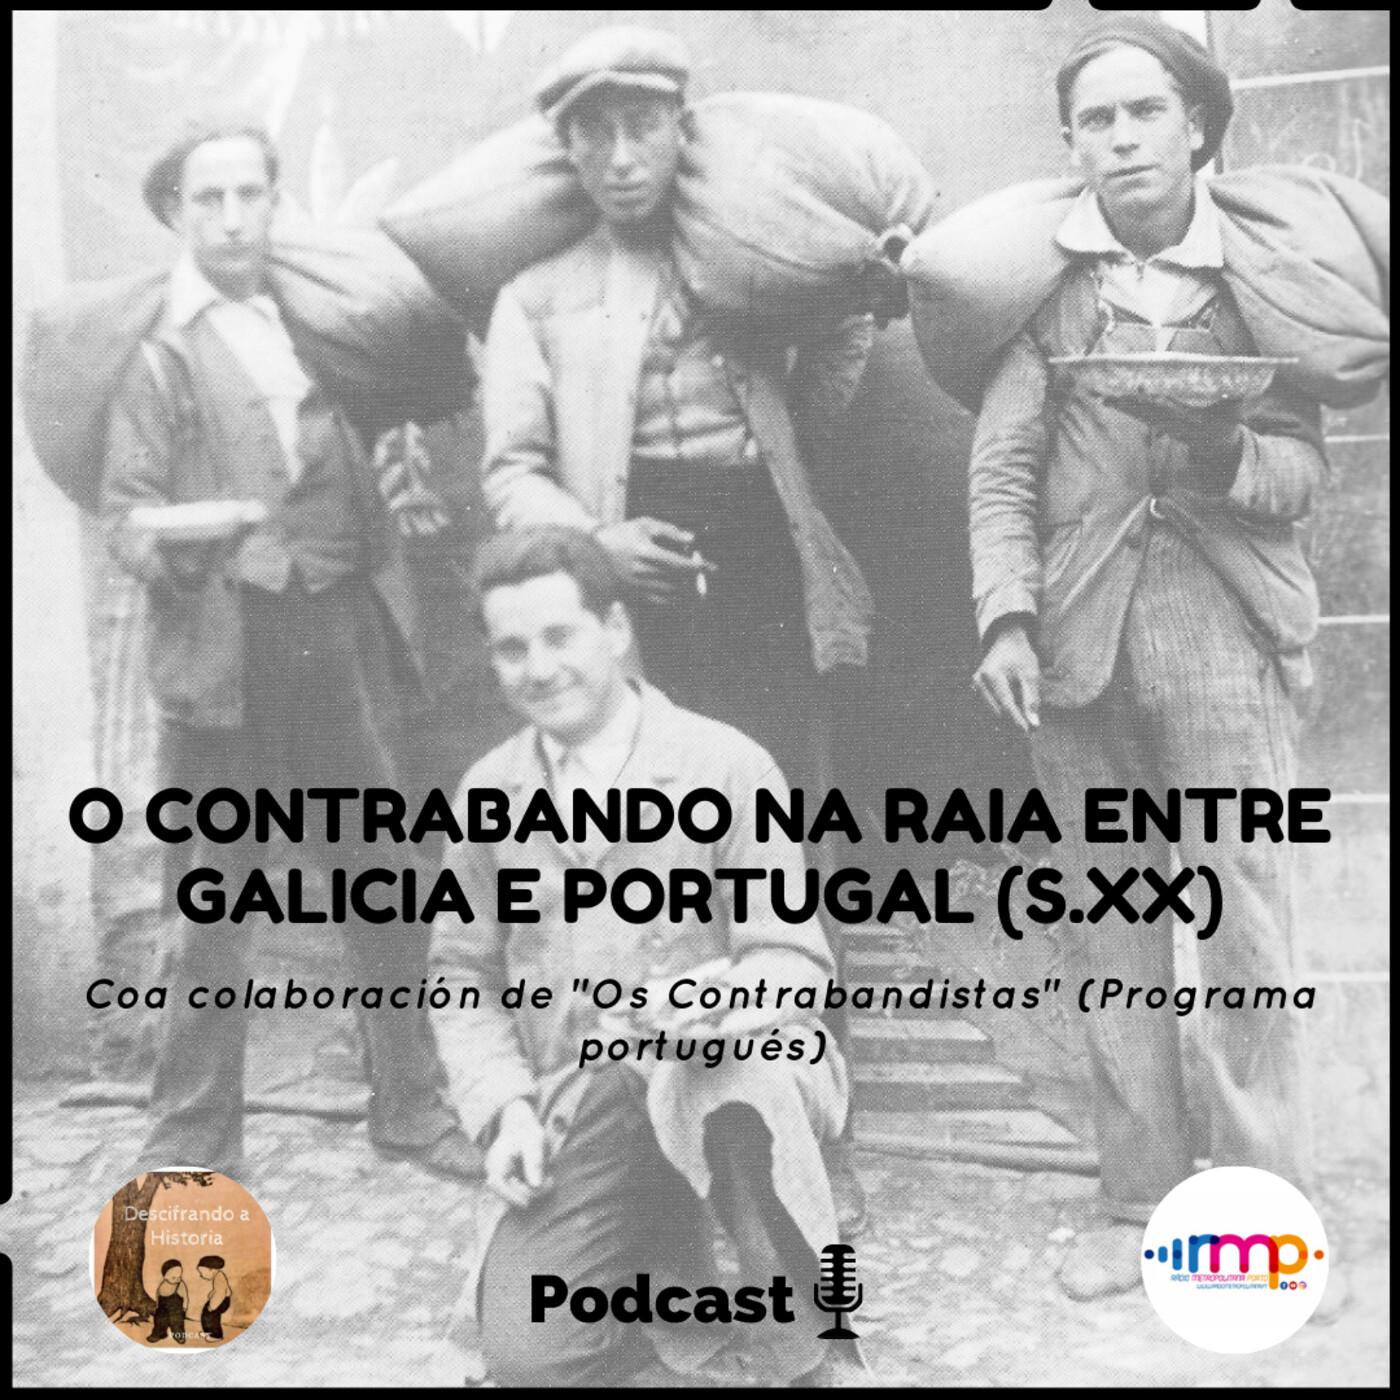 O contrabando na raia entre Galicia e Portugal